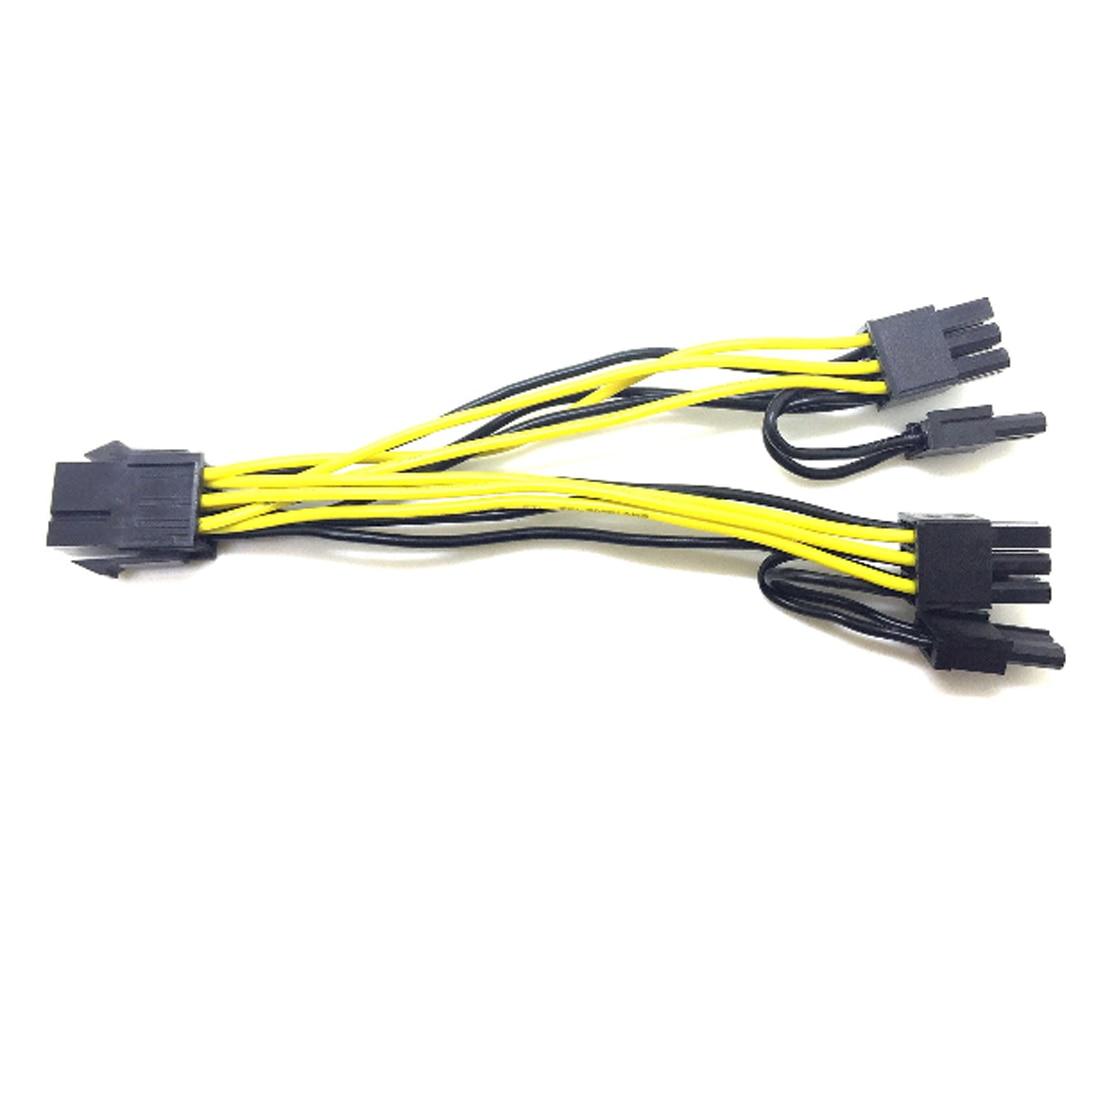 Marsnaska 6-pin PCI Express to 2 x PCIe 8 (6+2) pin Motherboard Graphics Video Card PCI-e GPU VGA Splitter Hub Power Cable graphics connection power supply cable cpu molex 8pin to 2 pci e 8 6 2 pin graphics card connector internal cable power splitter